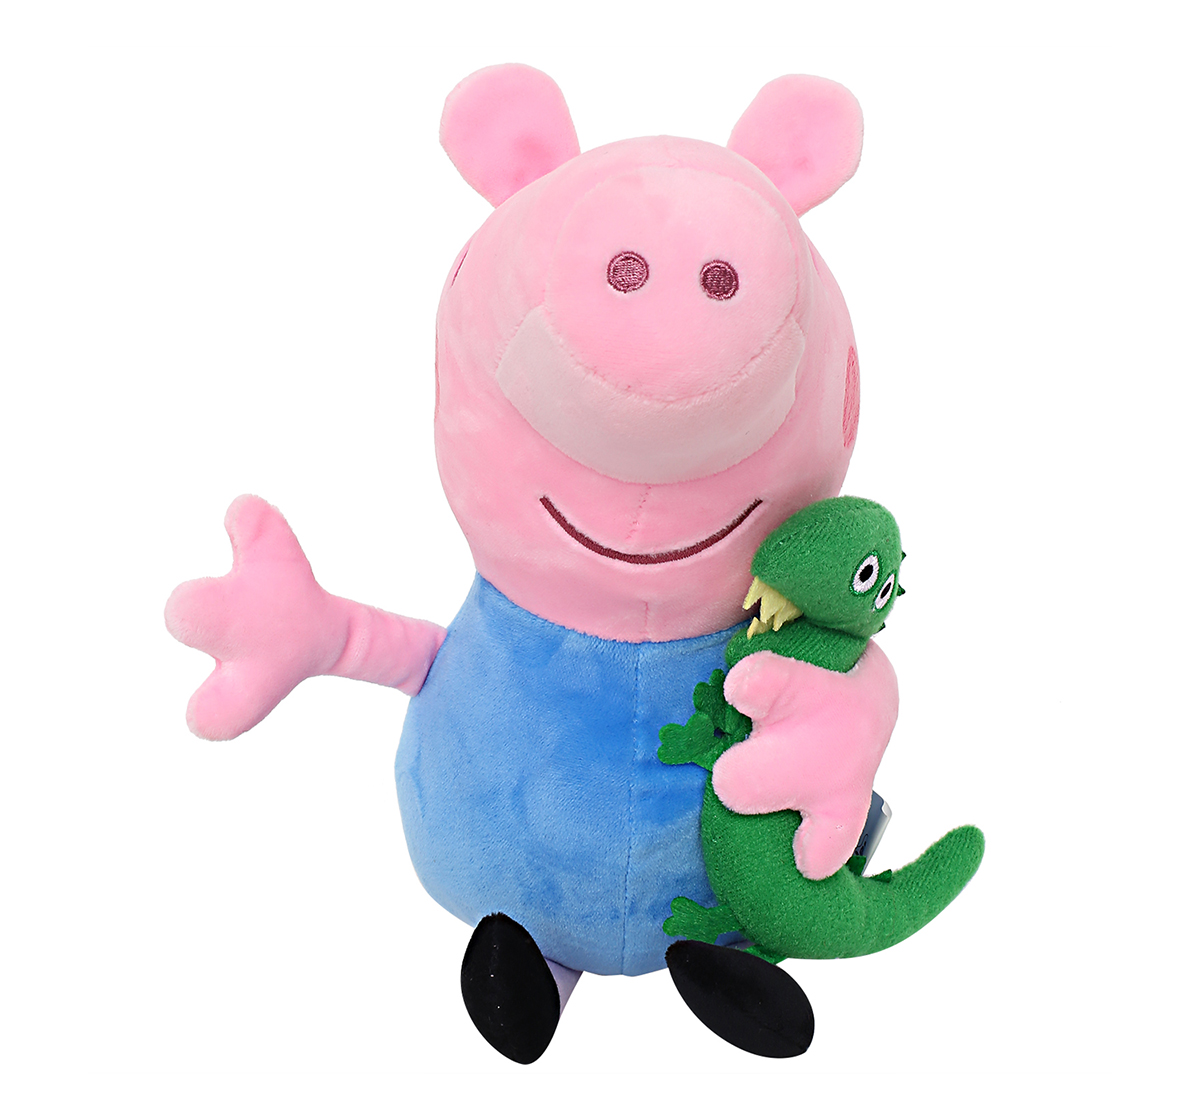 Peppa Pig | Peppa George Pig with Dinosaur 30 Cm Soft Toy for Kids age 2Y+ (Blue)